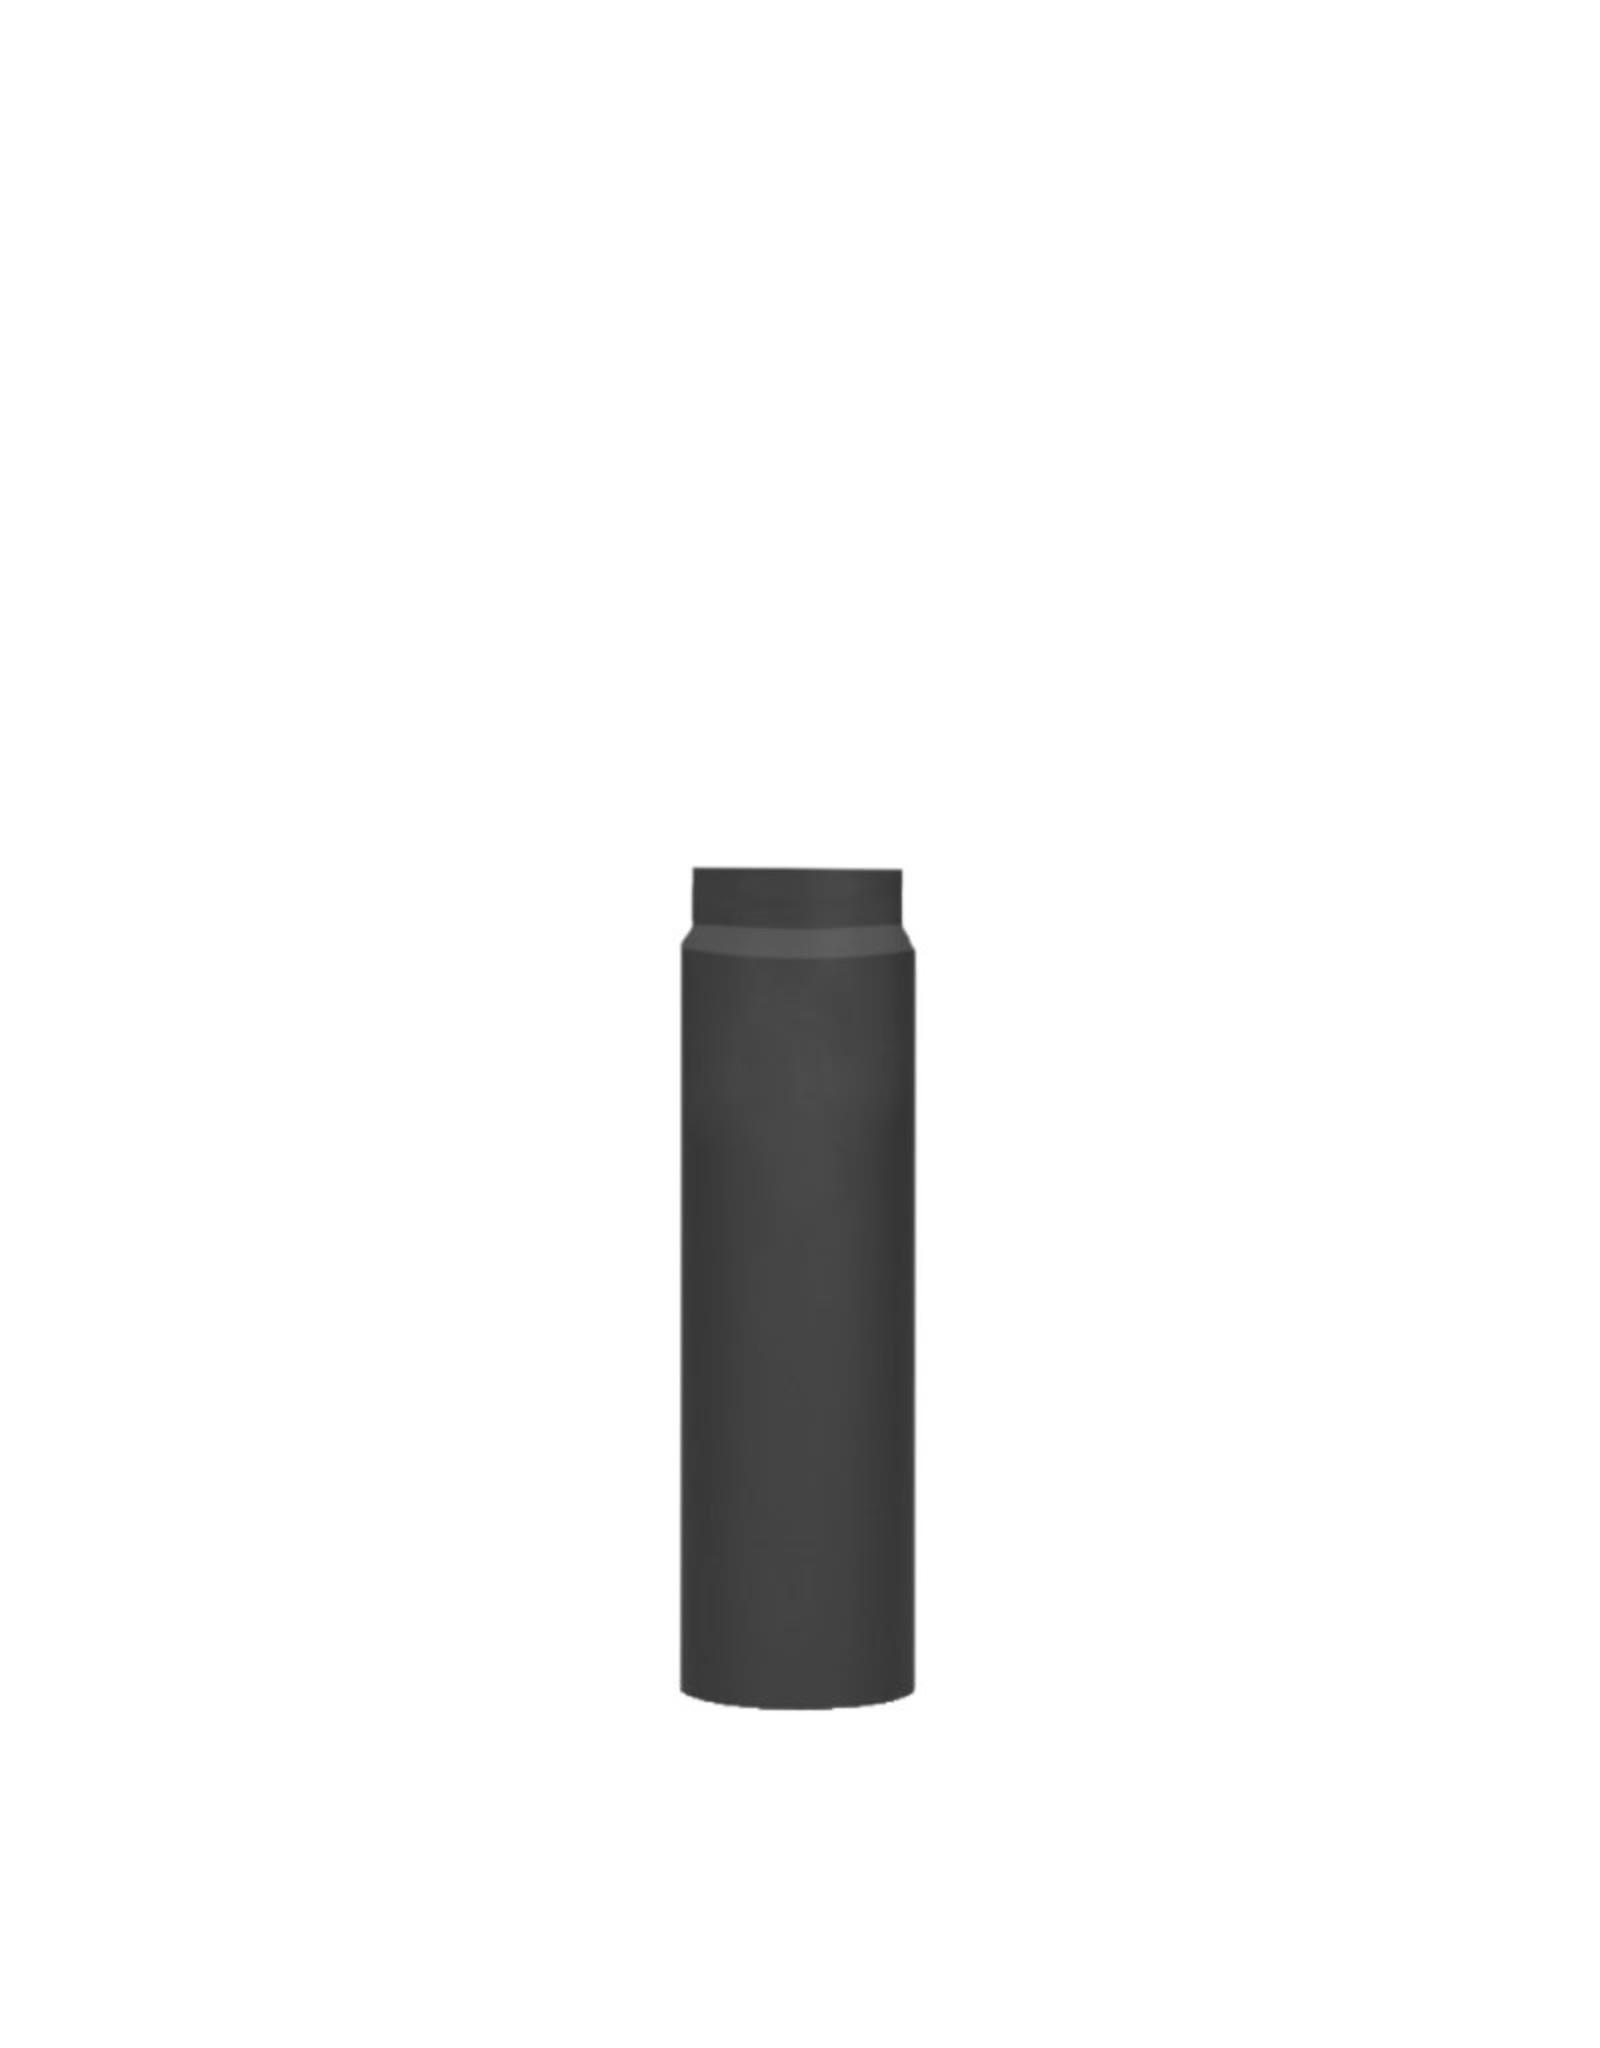 Cosi Cosistove Chimney pipe D150mm L500mm black